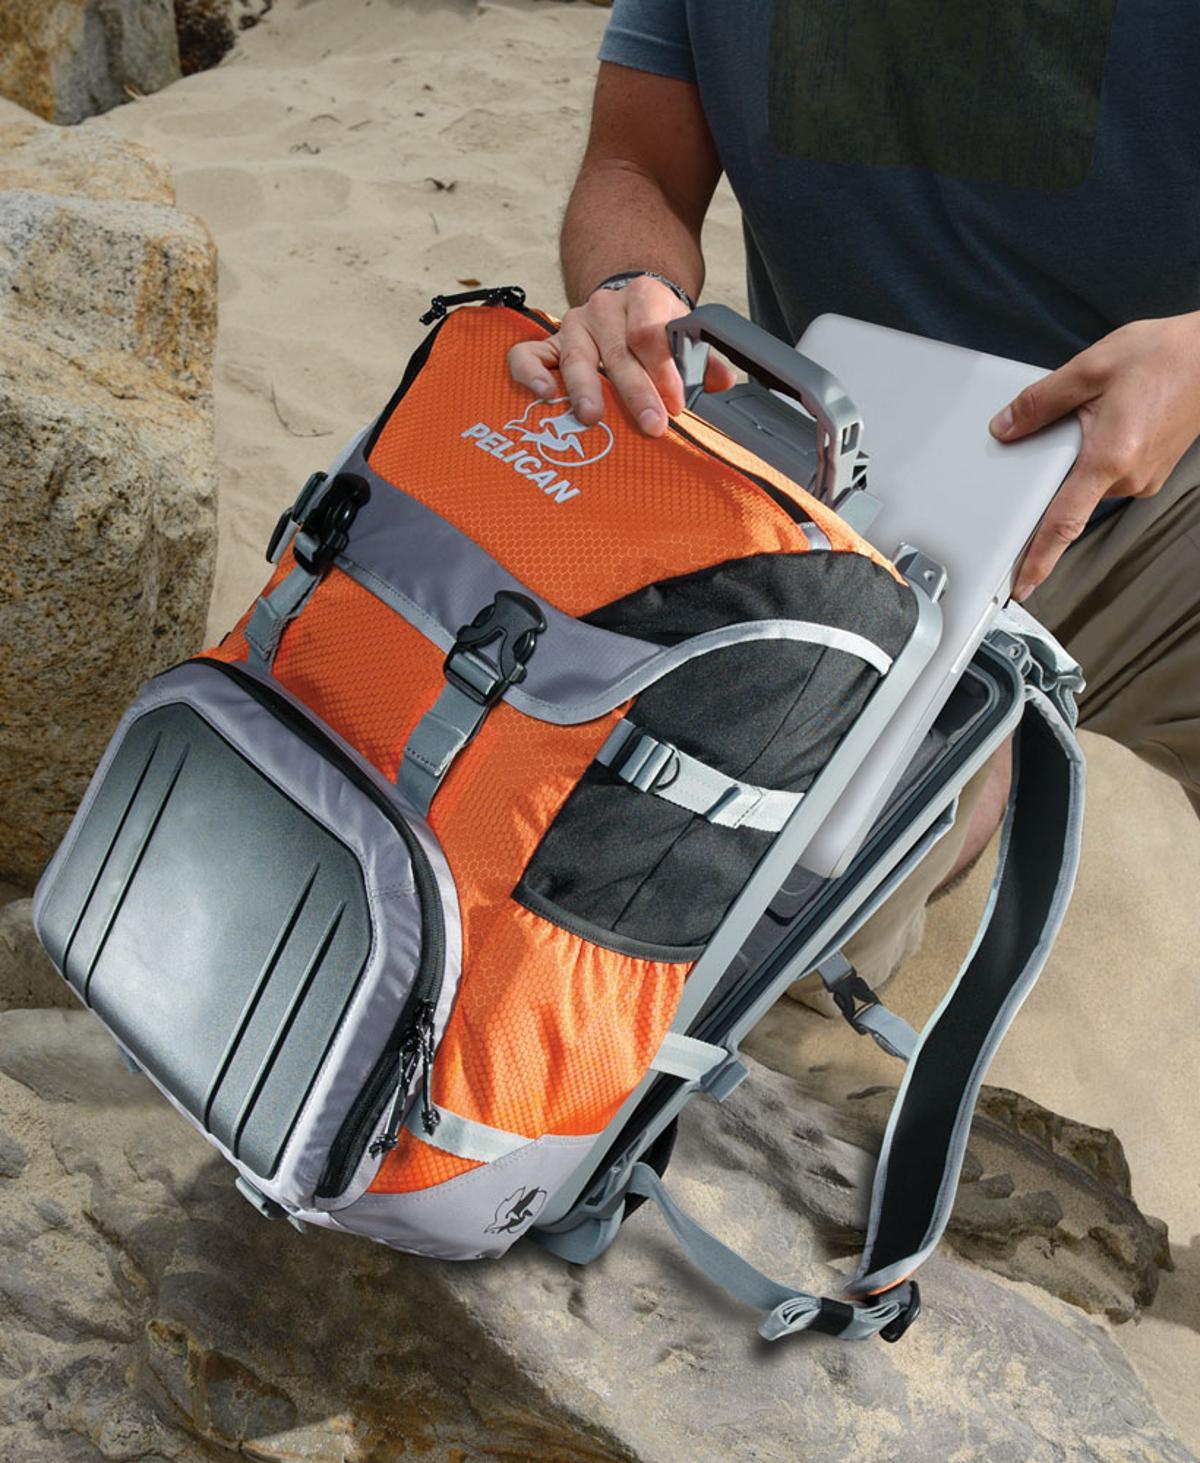 The Pelican ProGear S100 Sport Elite includes a hard, watertight laptop case in the back